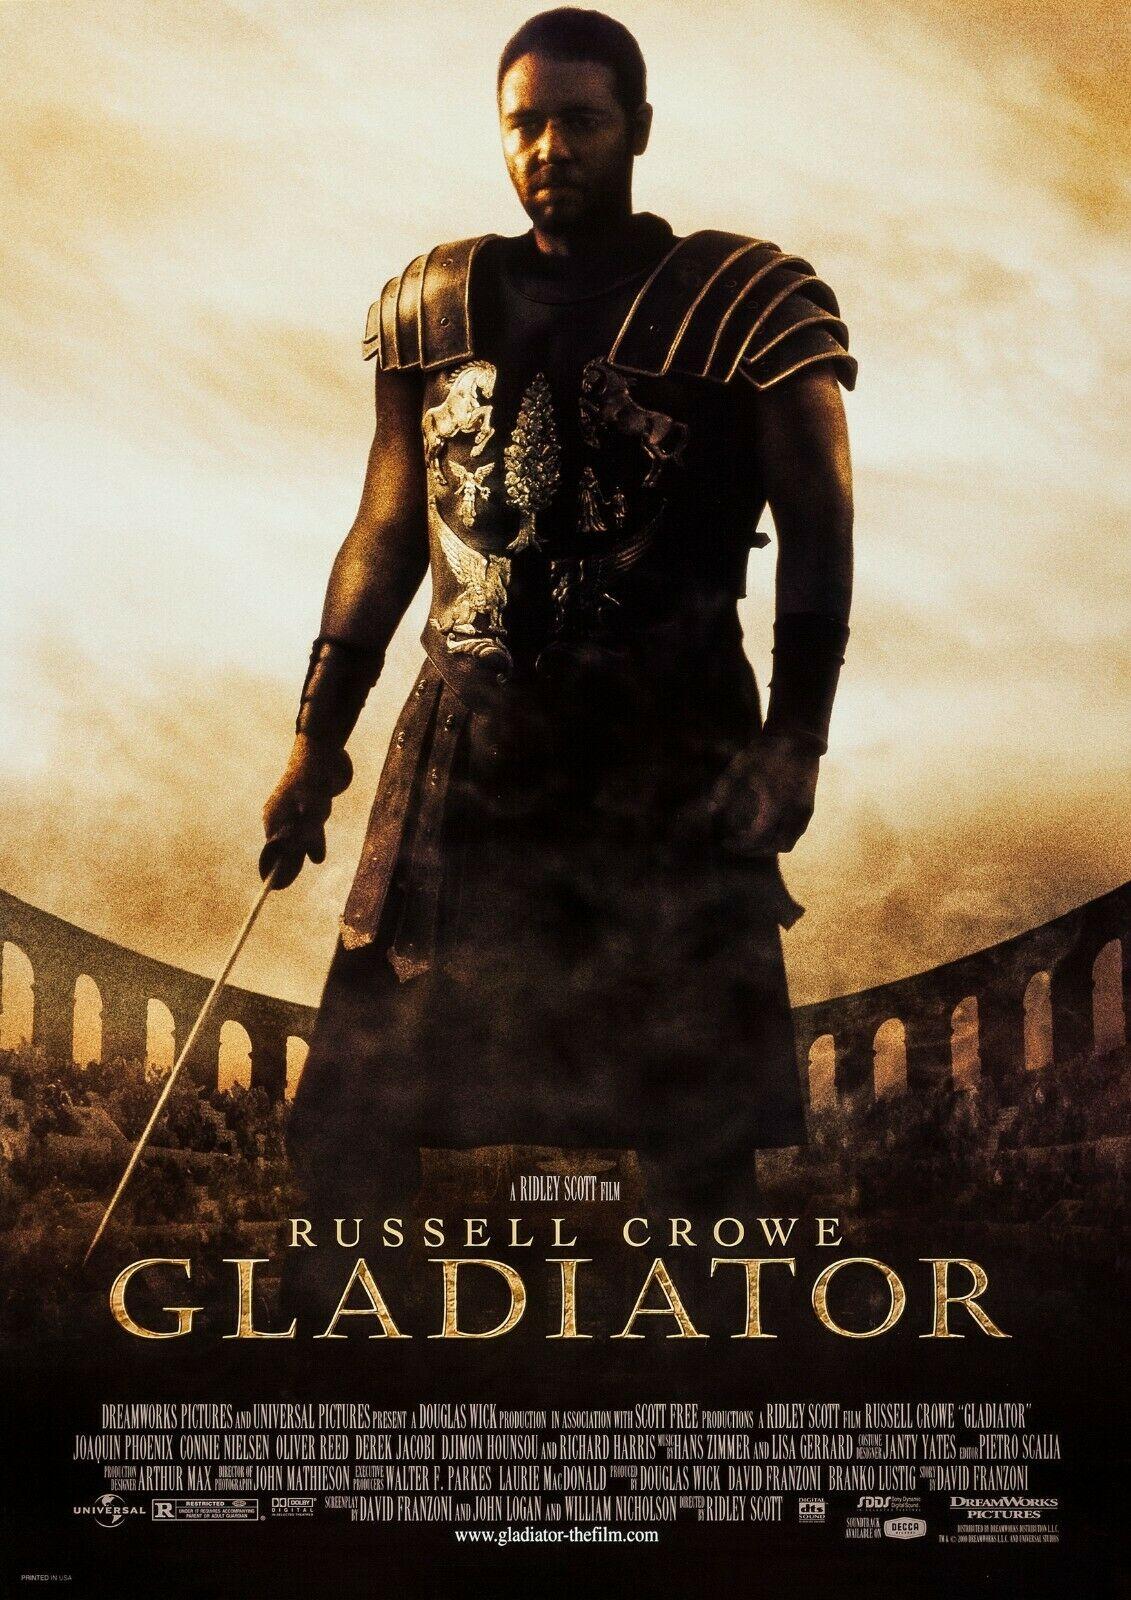 Gladiator (2000) *****